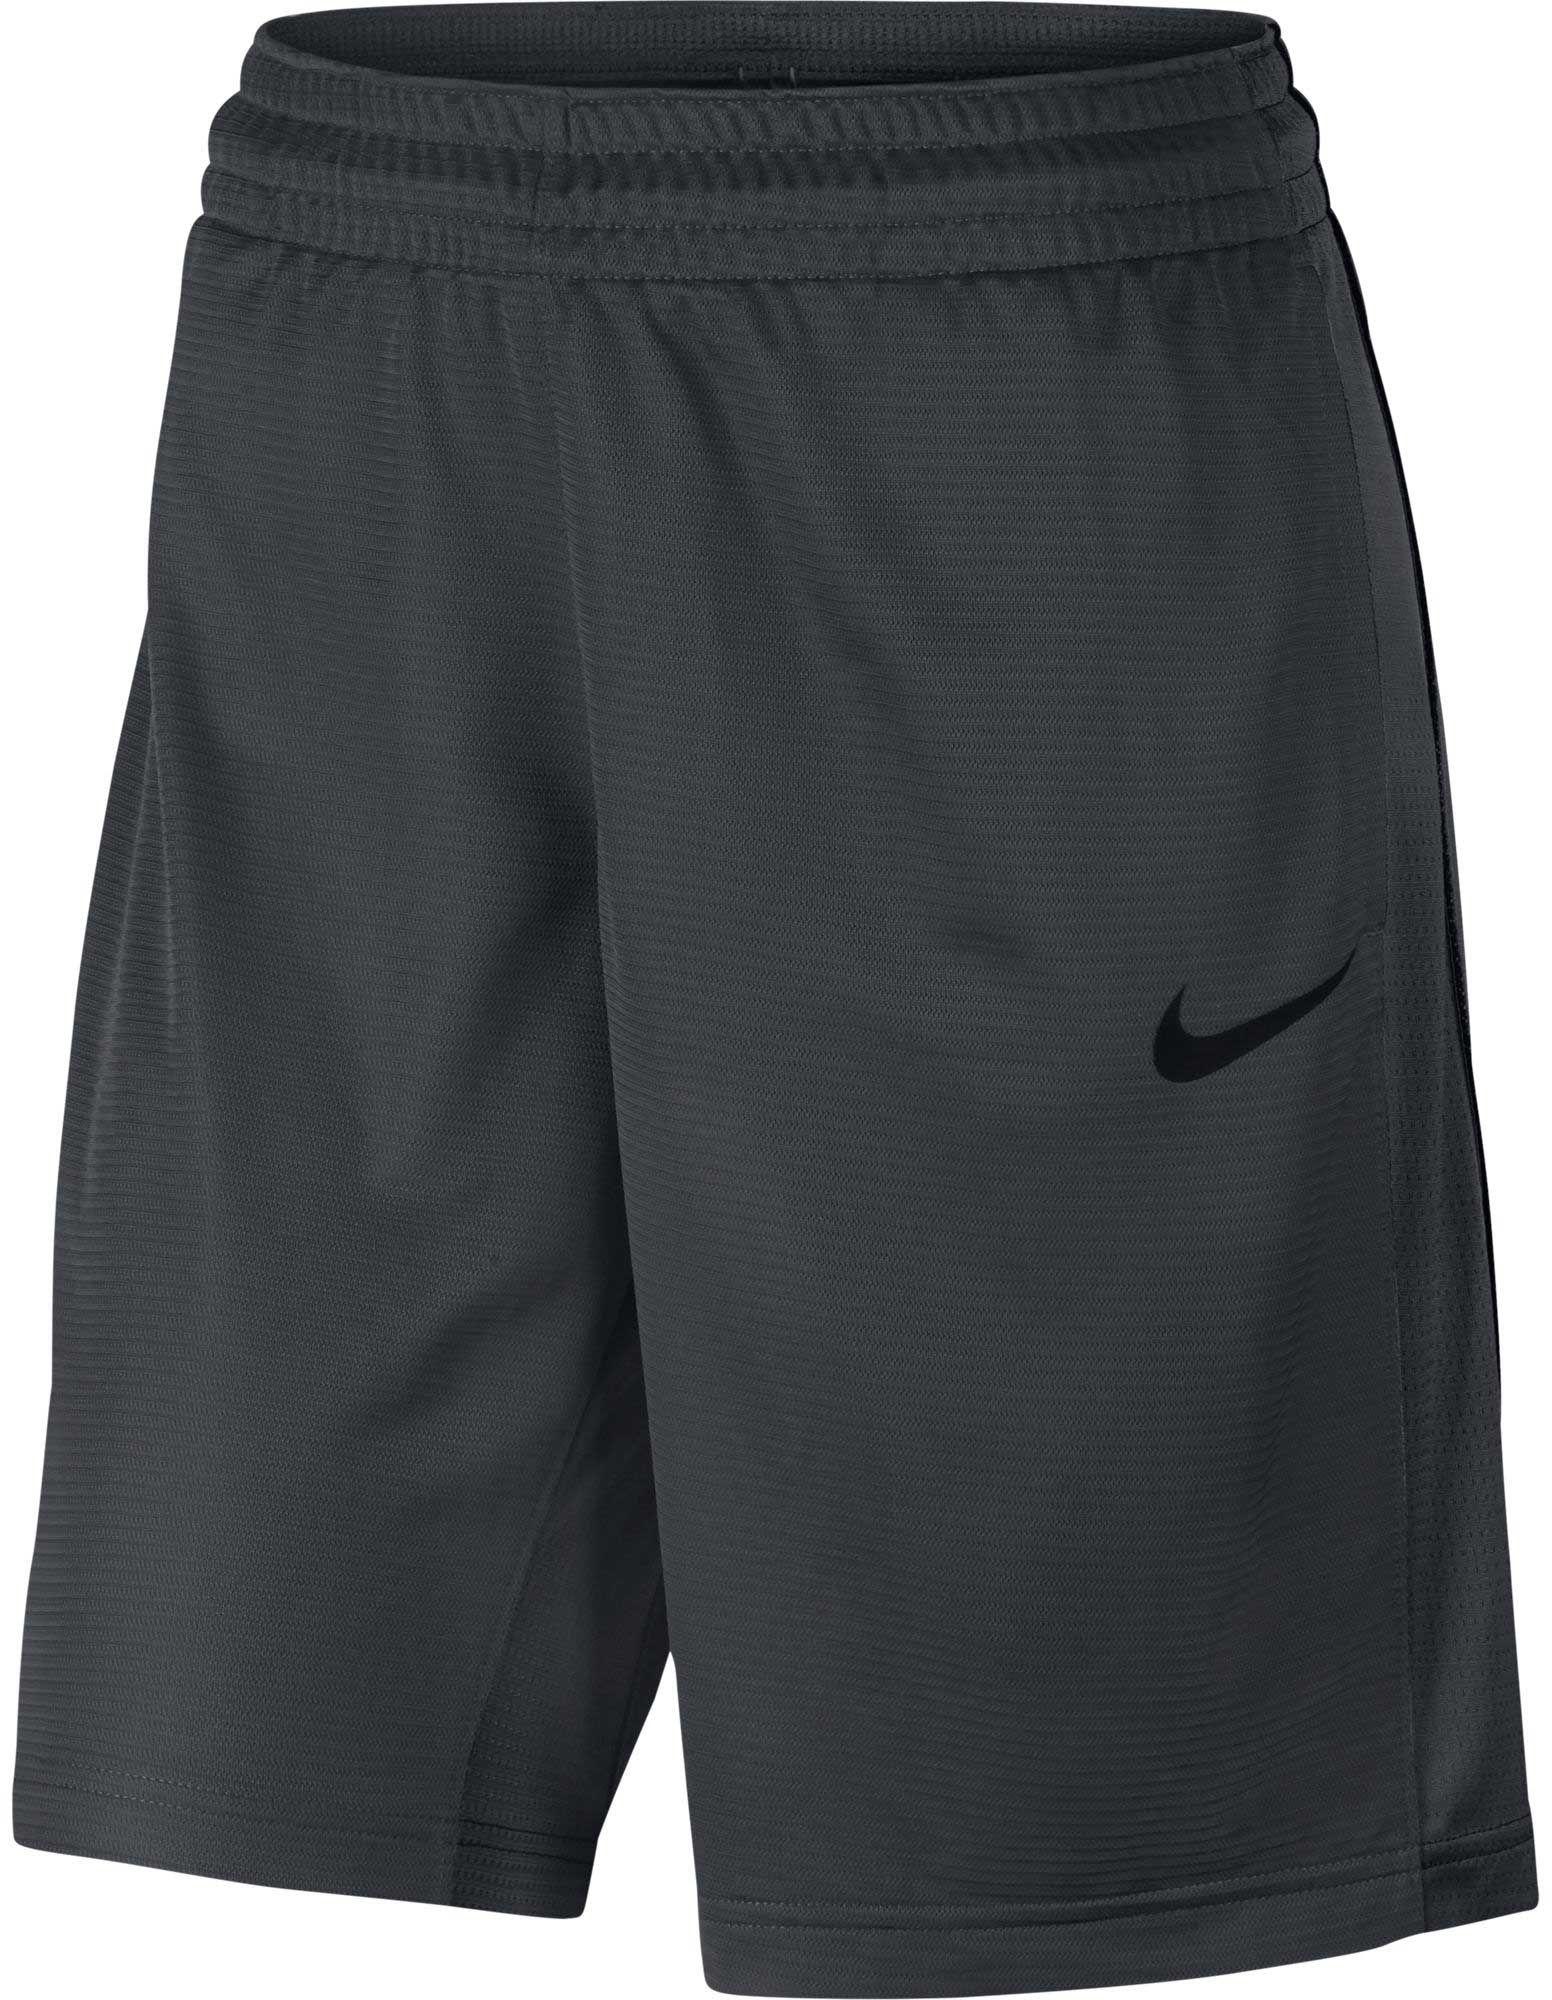 Nike Nike Motion Training Shorts Black/Black KCT